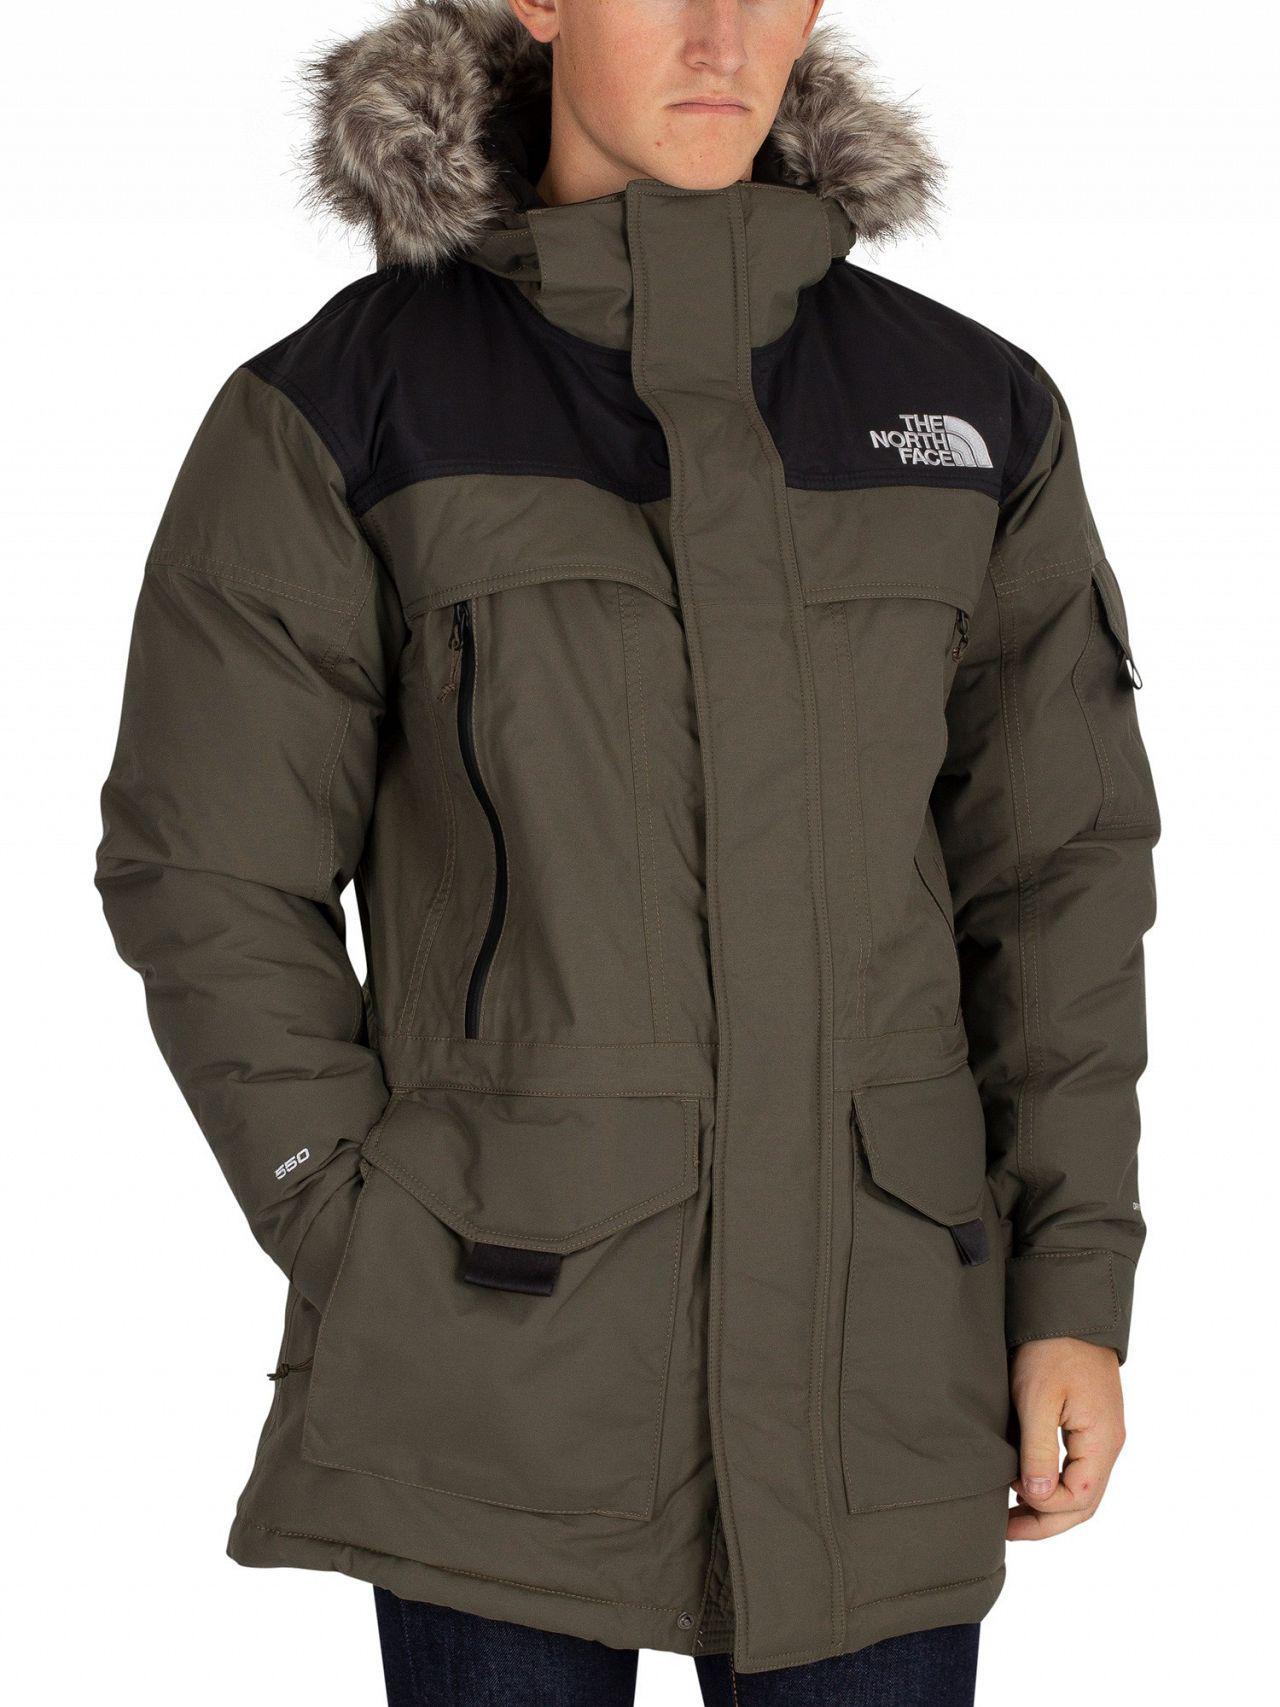 8f2cebb4ea The North Face Green black Murdo Parka Jacket in Green for Men - Lyst